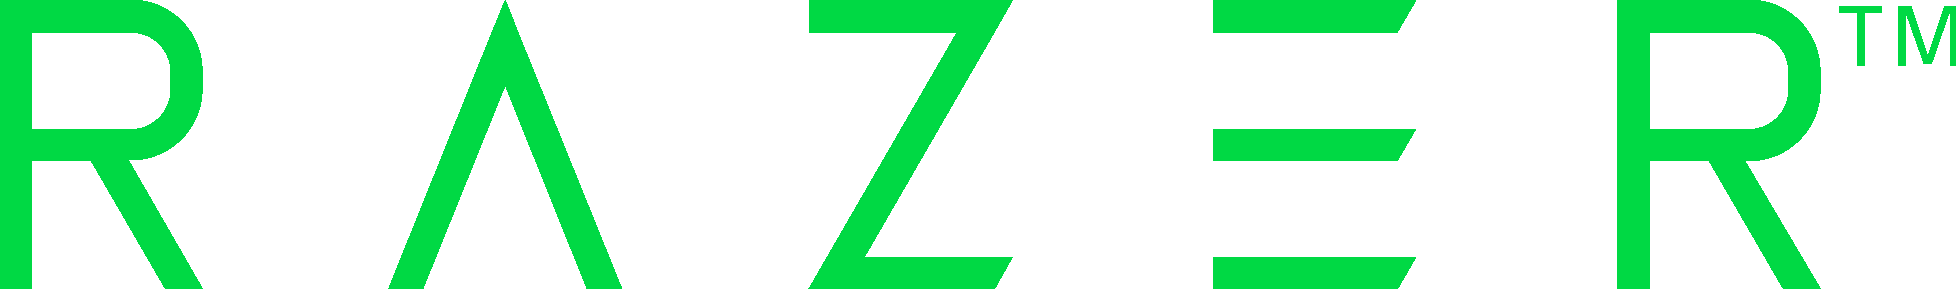 razer-logo.png